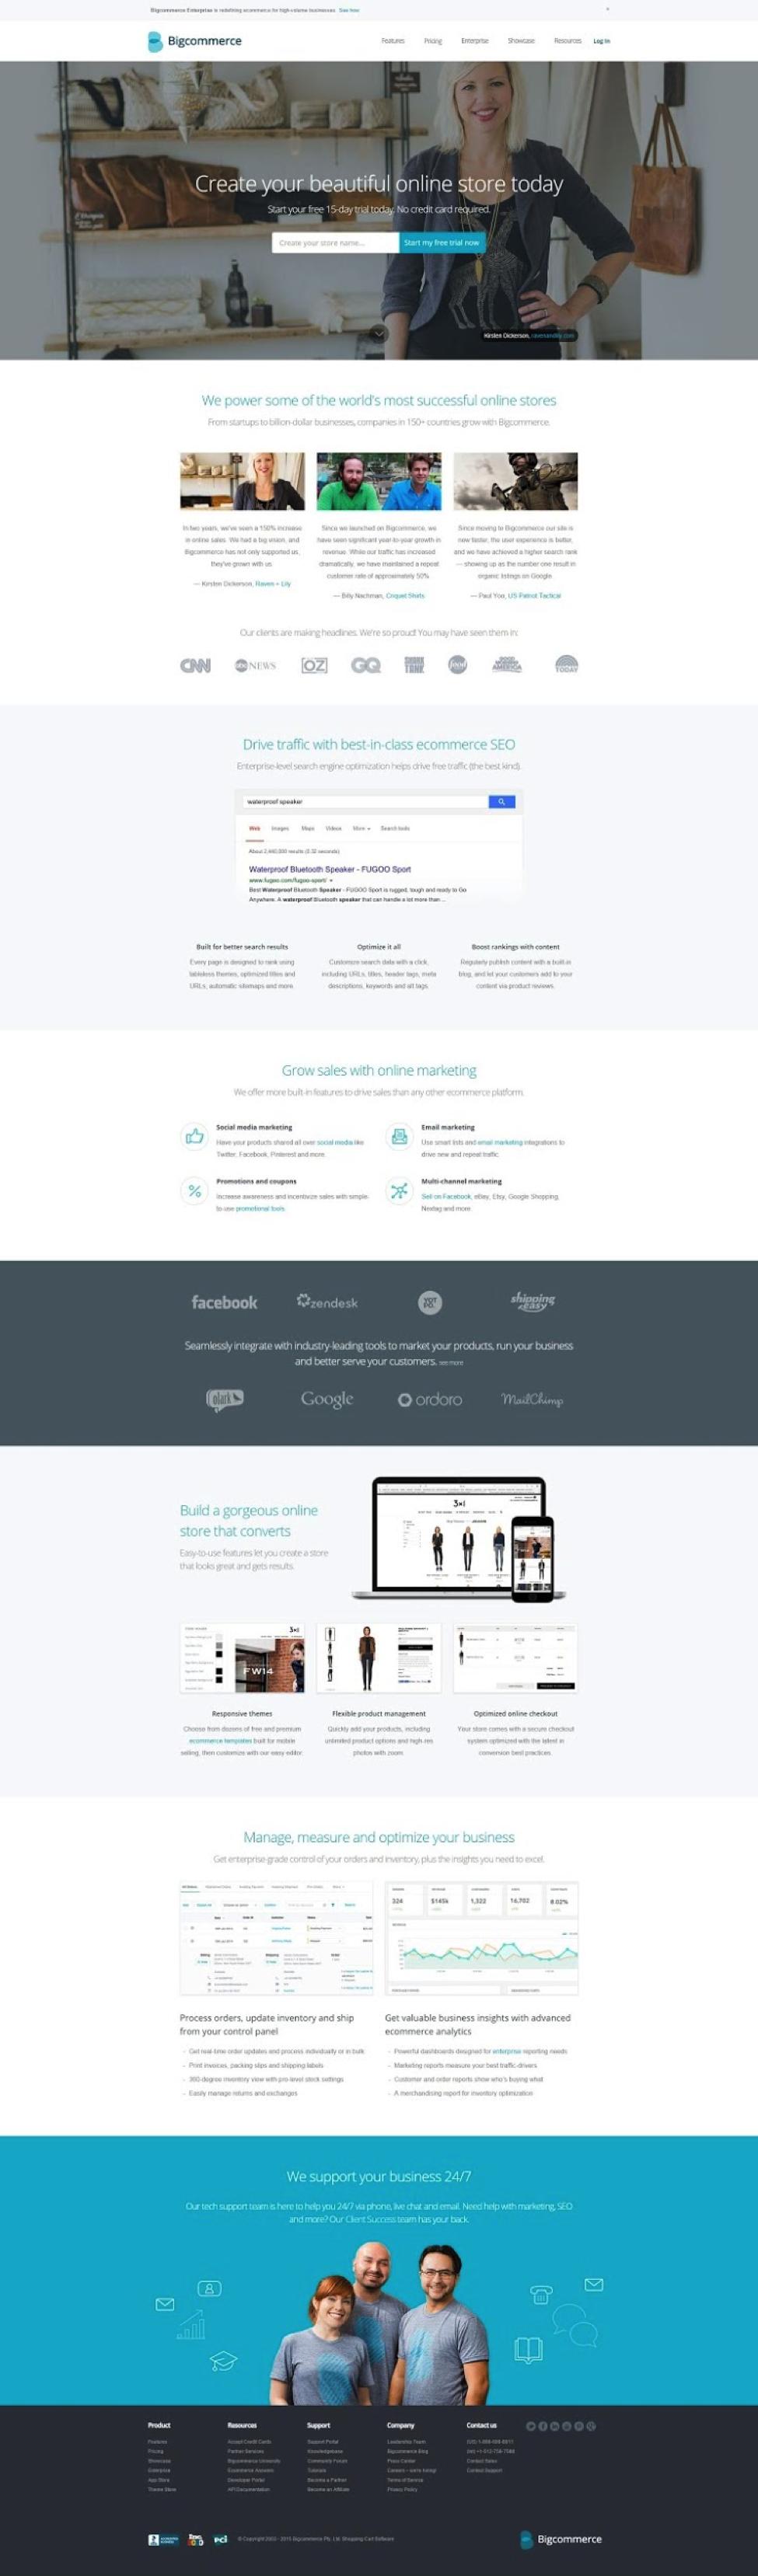 homepage-examples-air-bnb